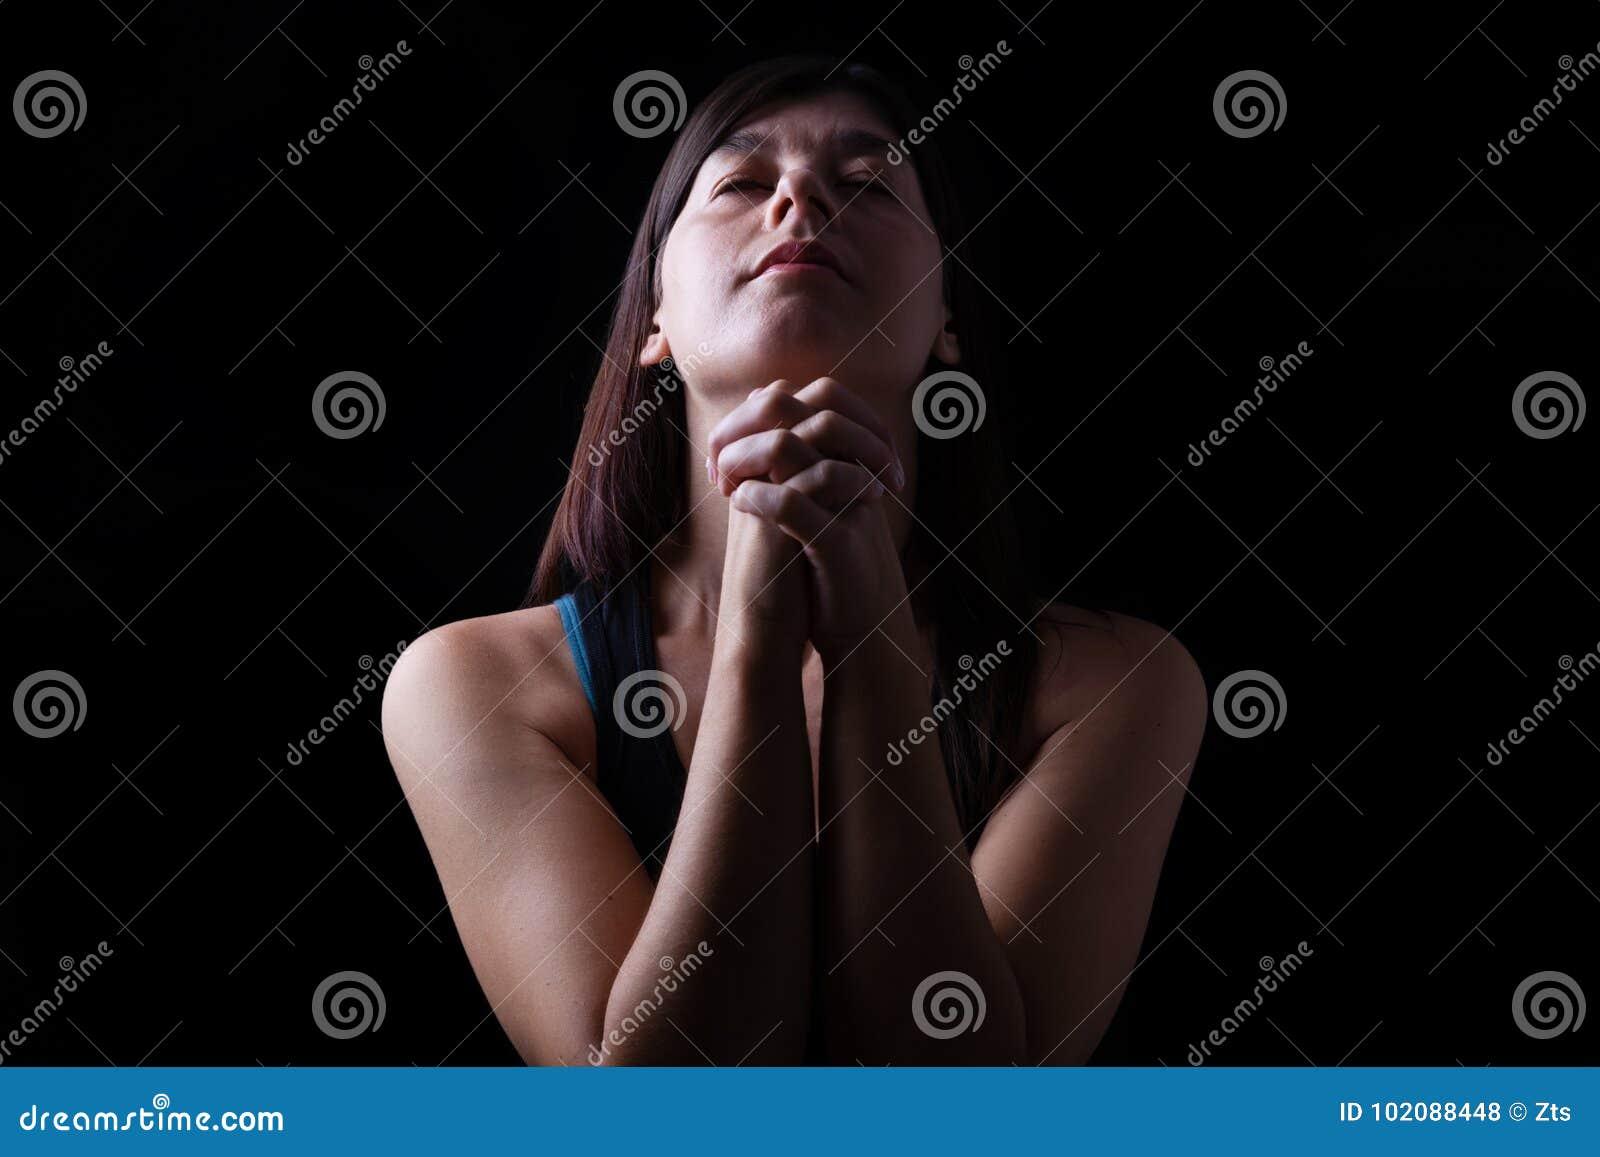 Faithful woman praying, hands folded in worship